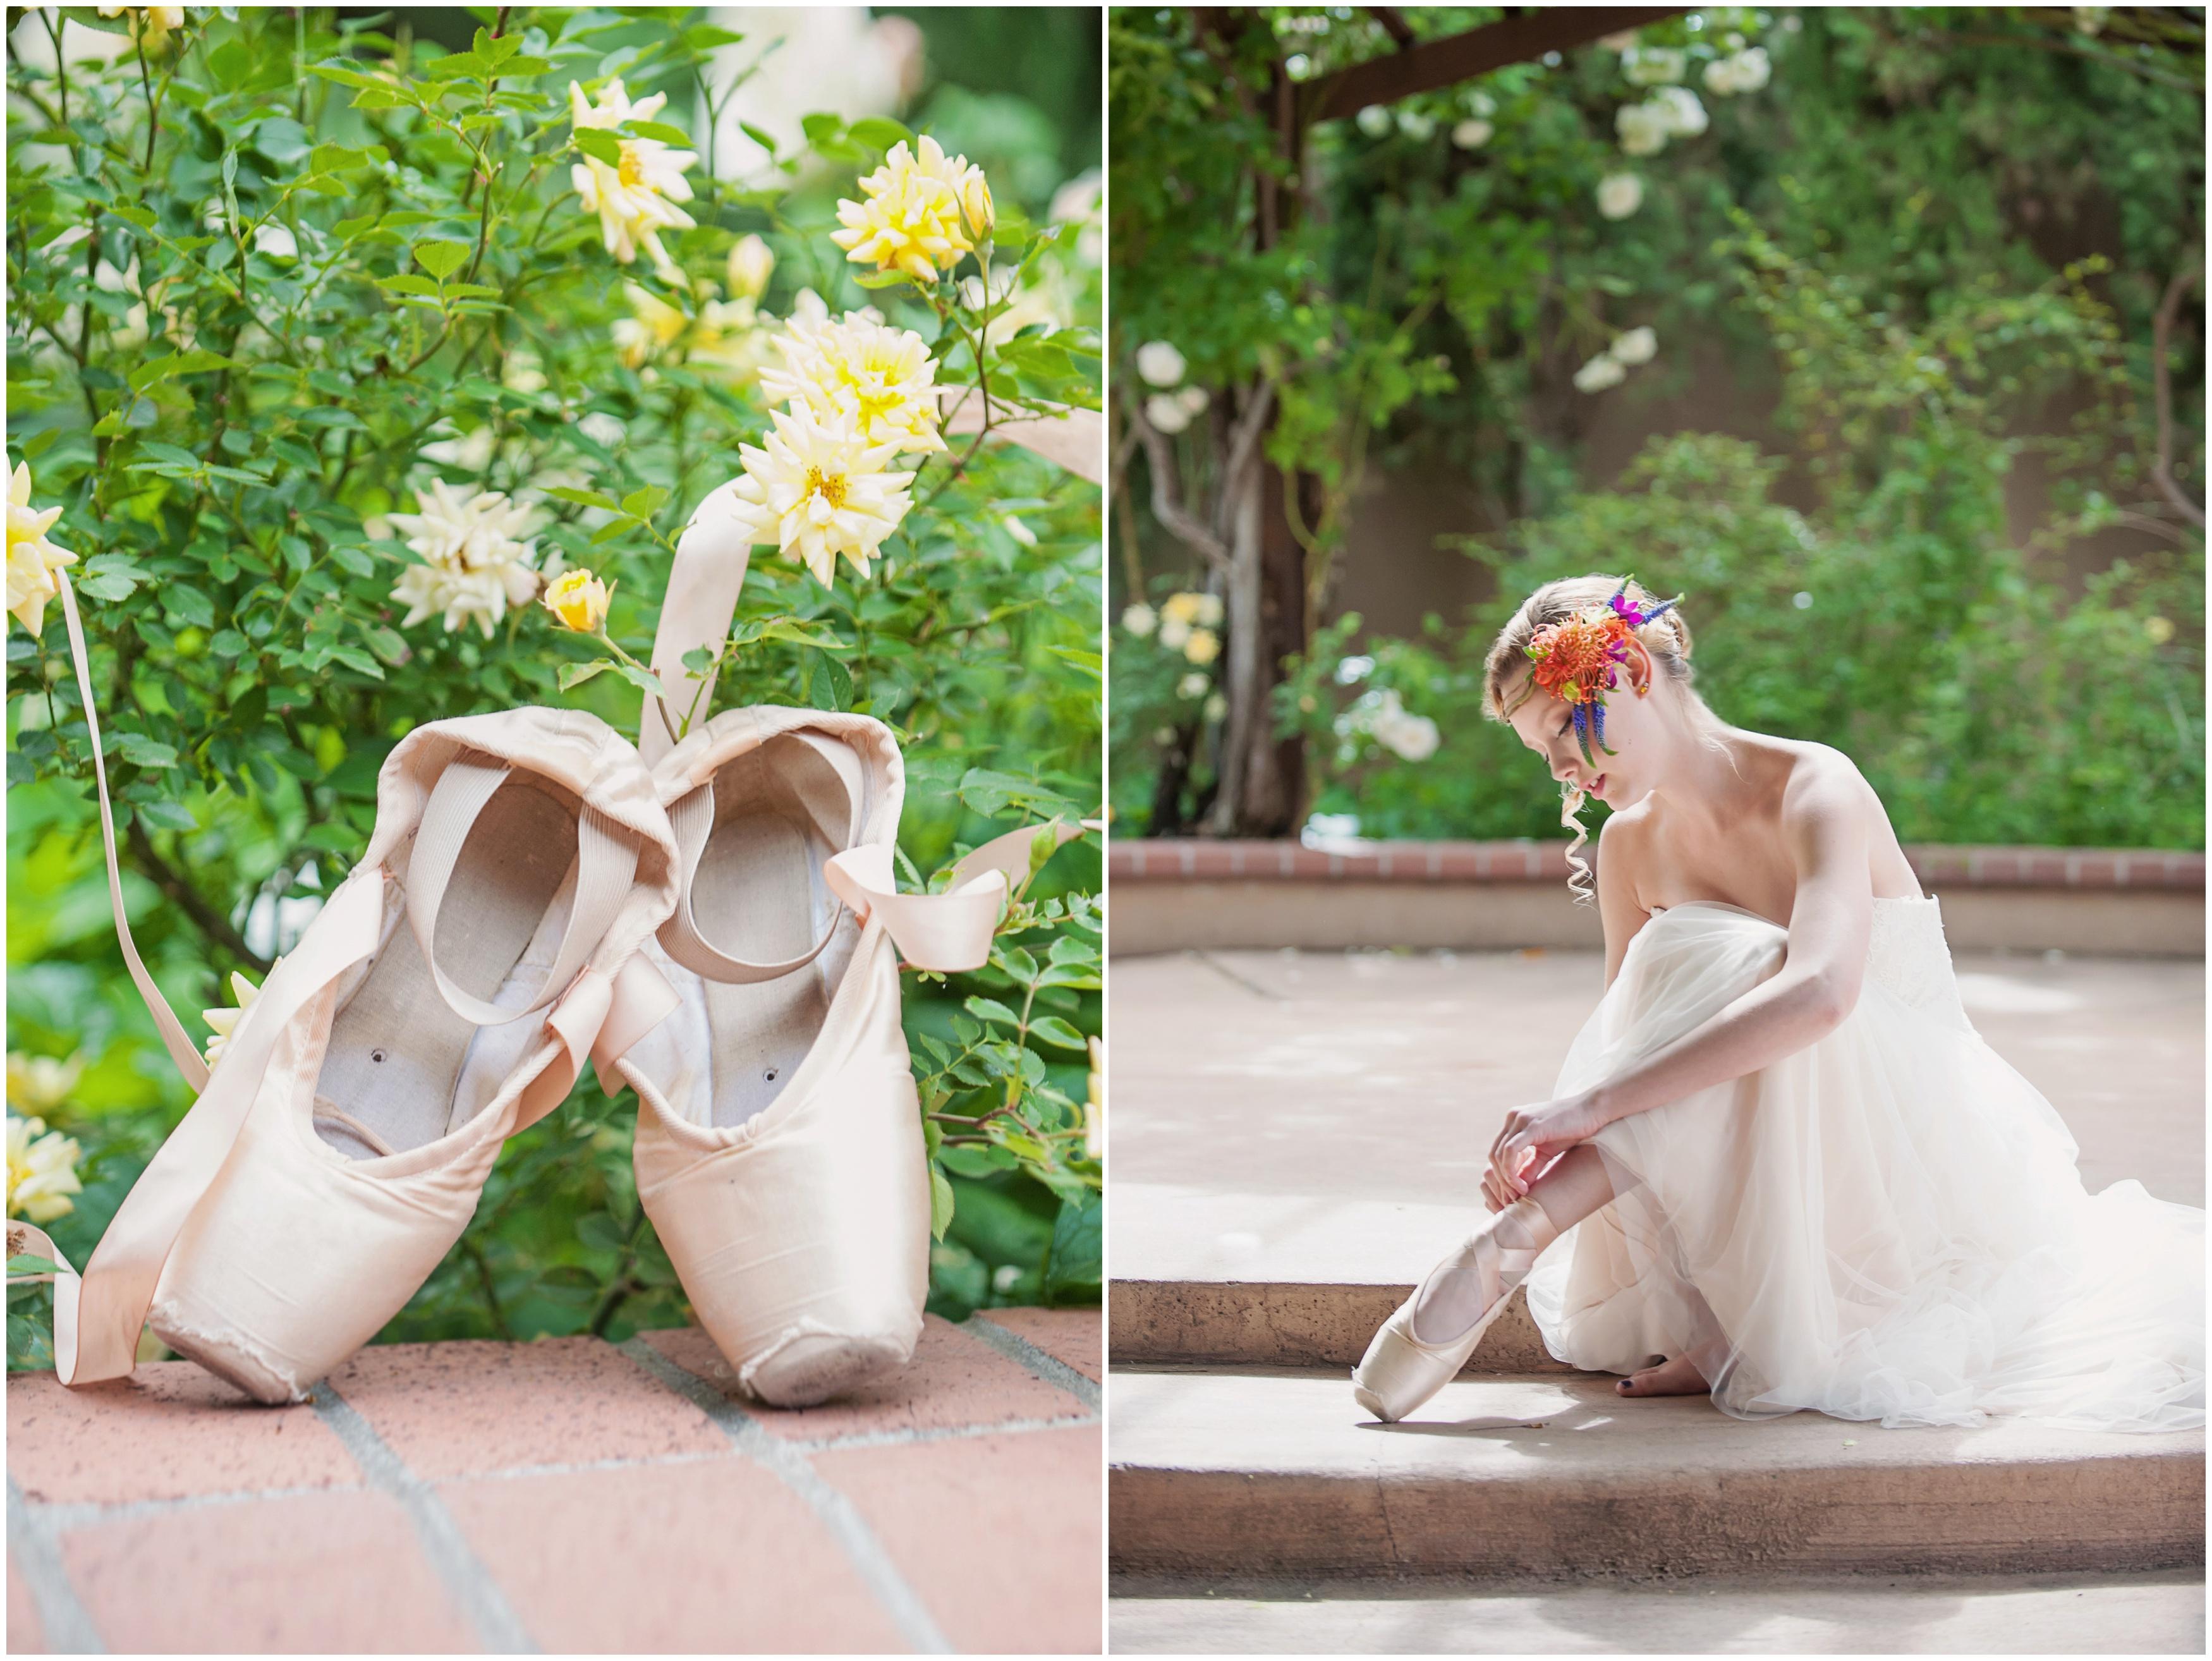 ballerina_brides_botanical_gardens_0003.jpg